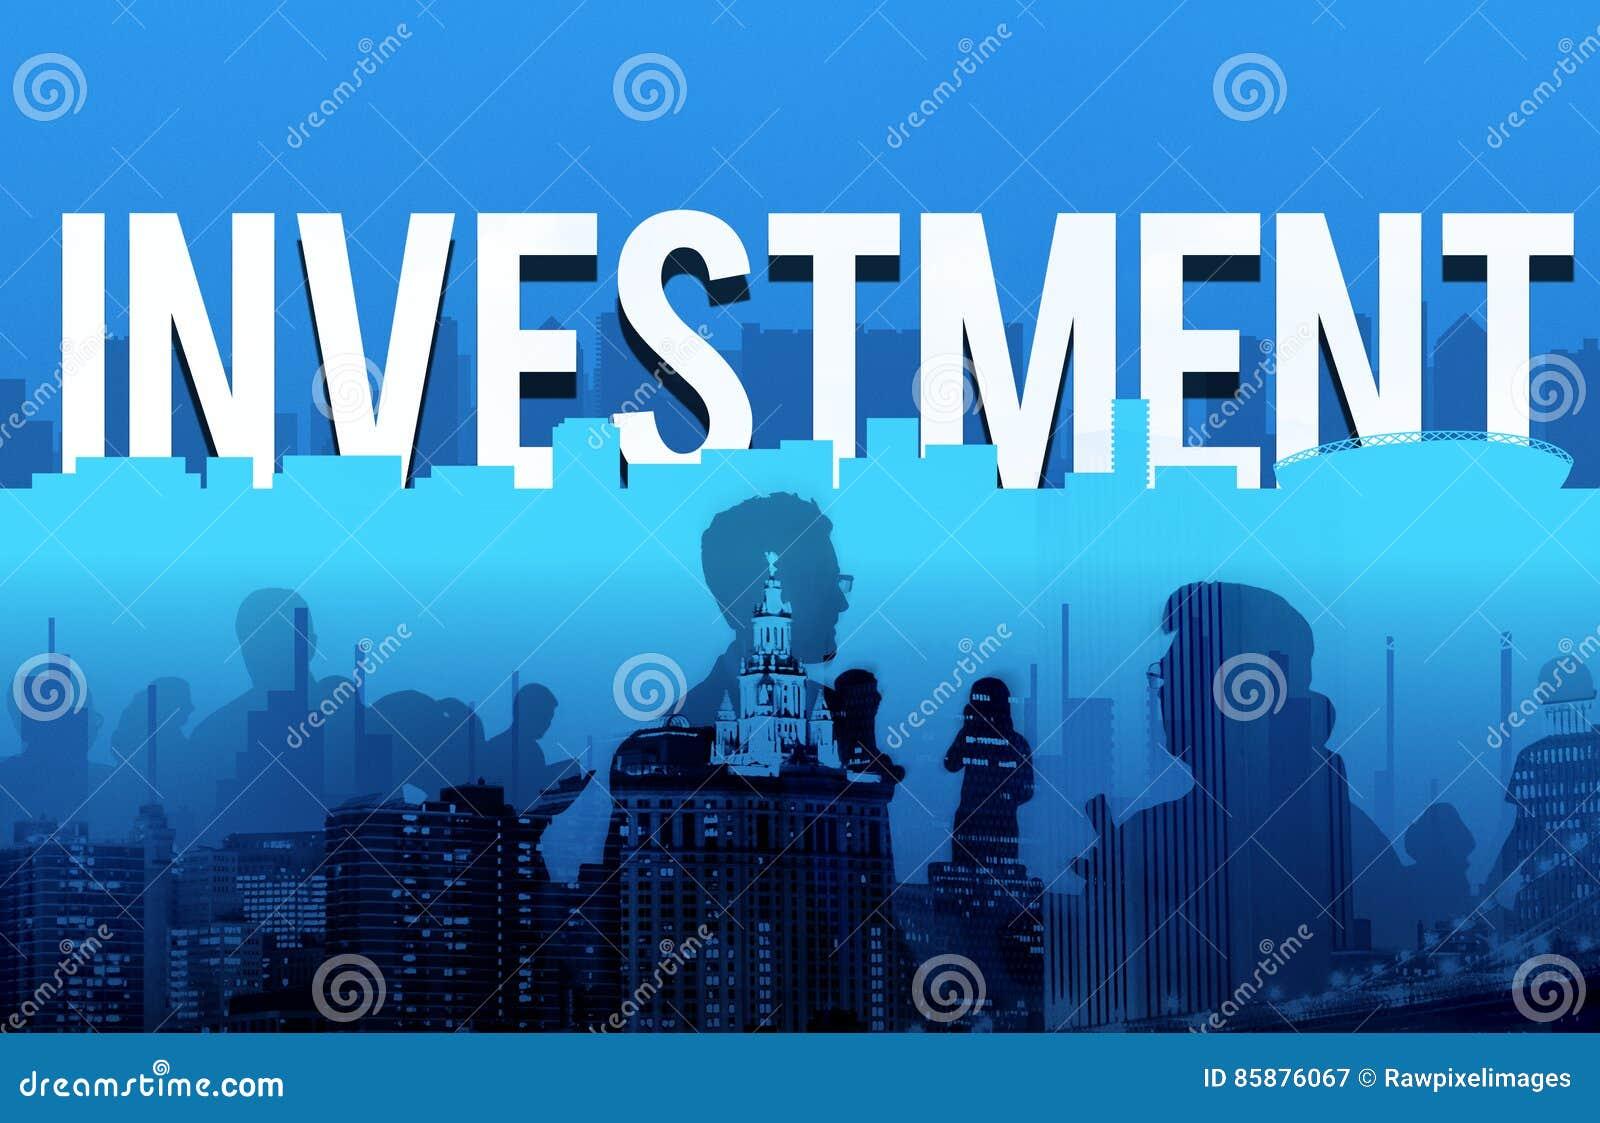 Investment Business Financial Risk Management Concept